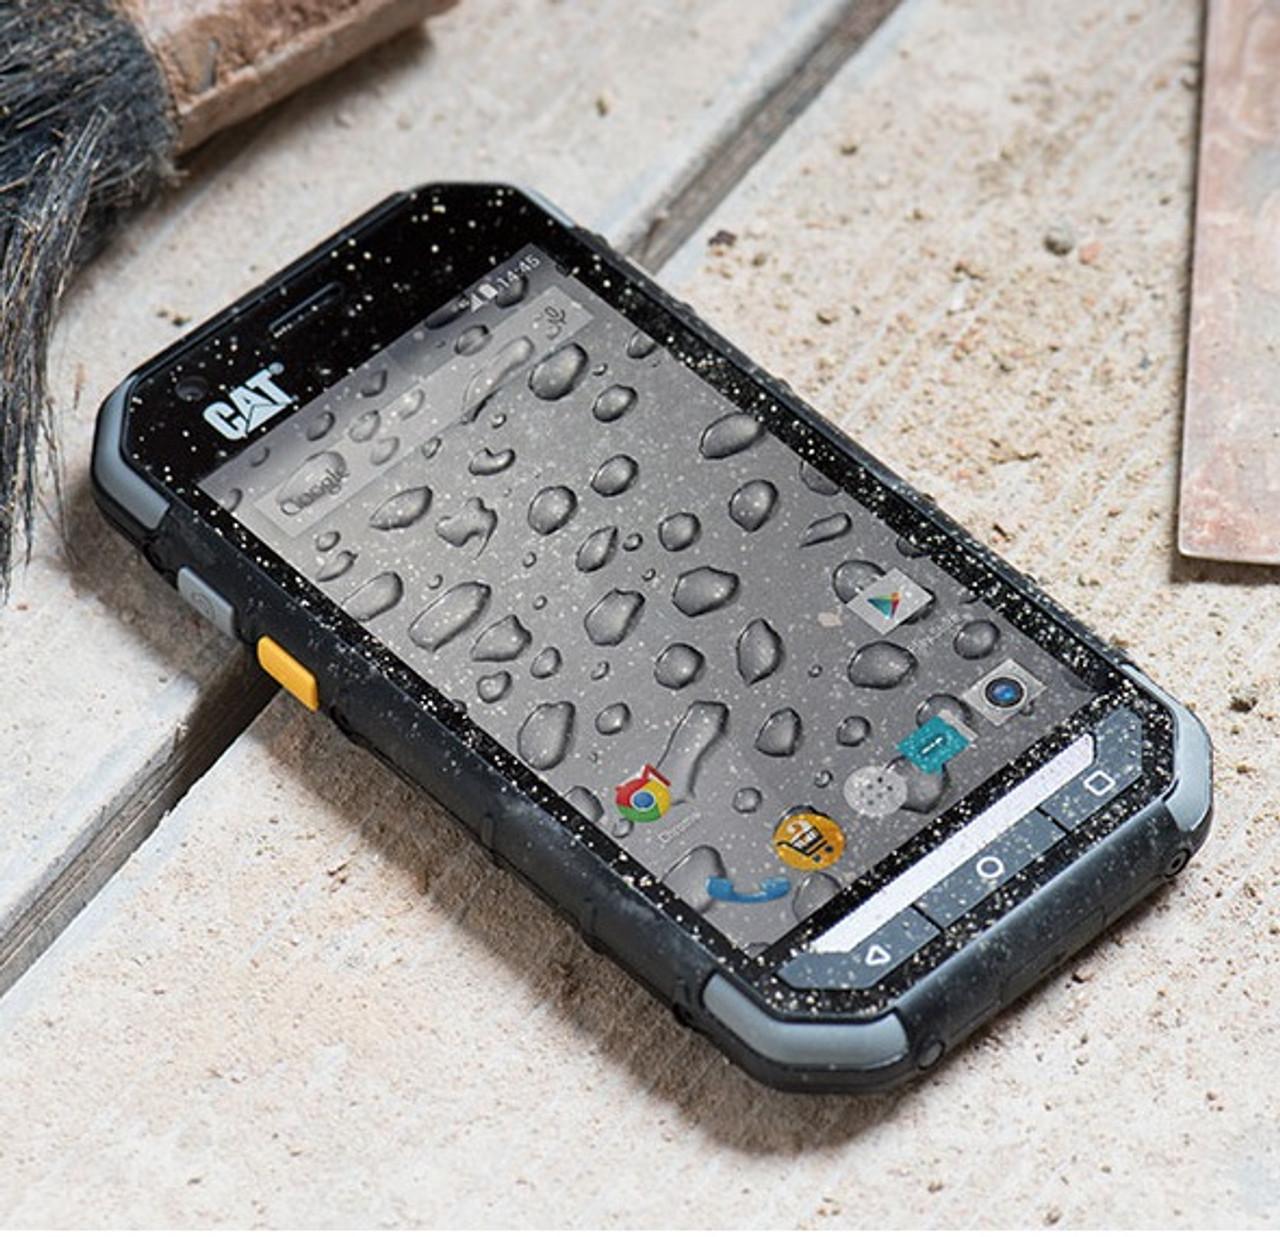 Cat S30 Affordable Waterproof Rugged Smartphone Unlocked